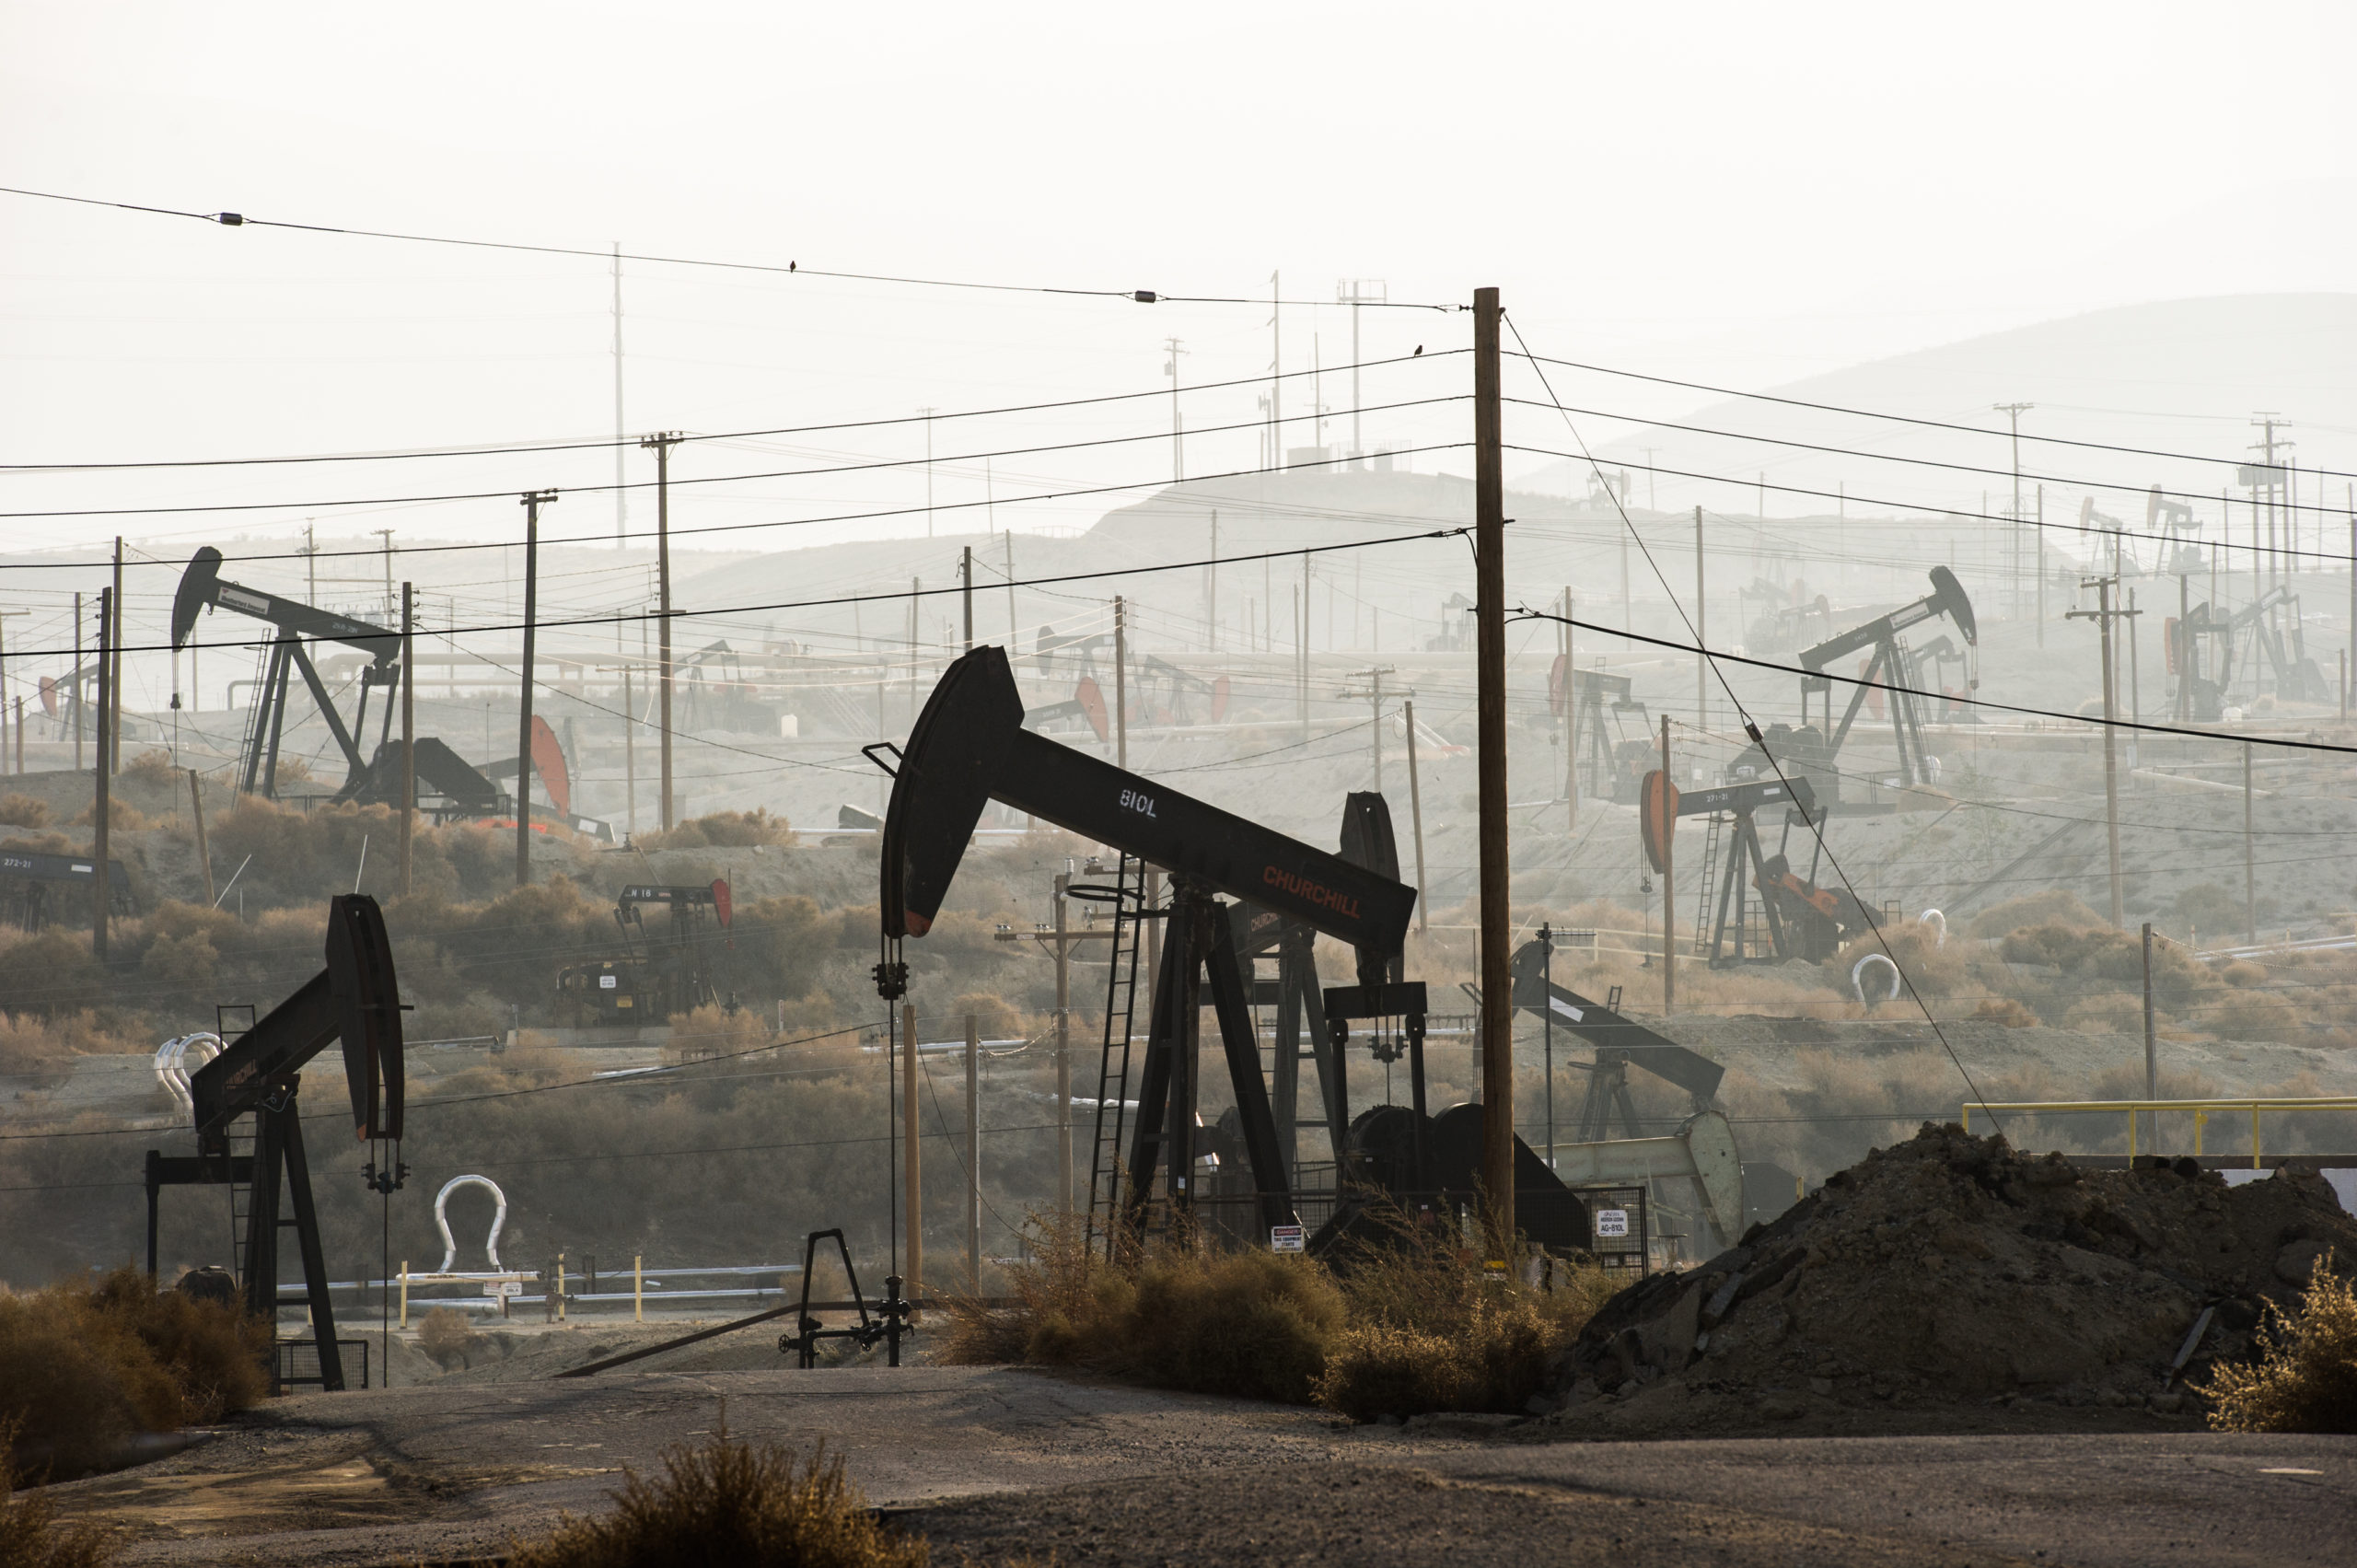 Ny type klimakamp: Stater sendes i retten for at nøle på klimafronten